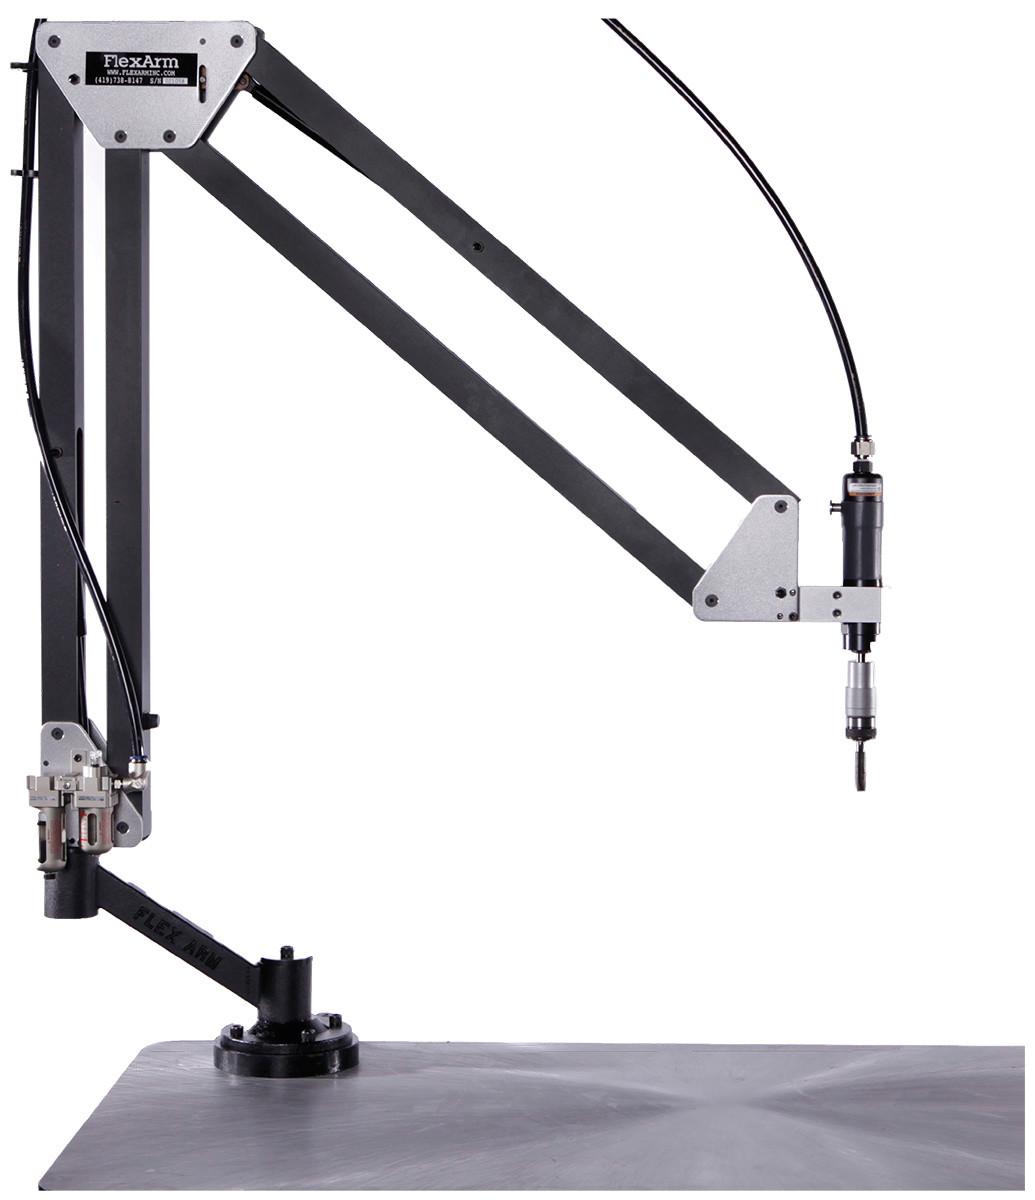 Flexarm Pneumatic Tapping Arms Penn Tool Co Inc The Pedestal Base Of My Fareastknockoff A Baldor Carbide Grinder Image 1